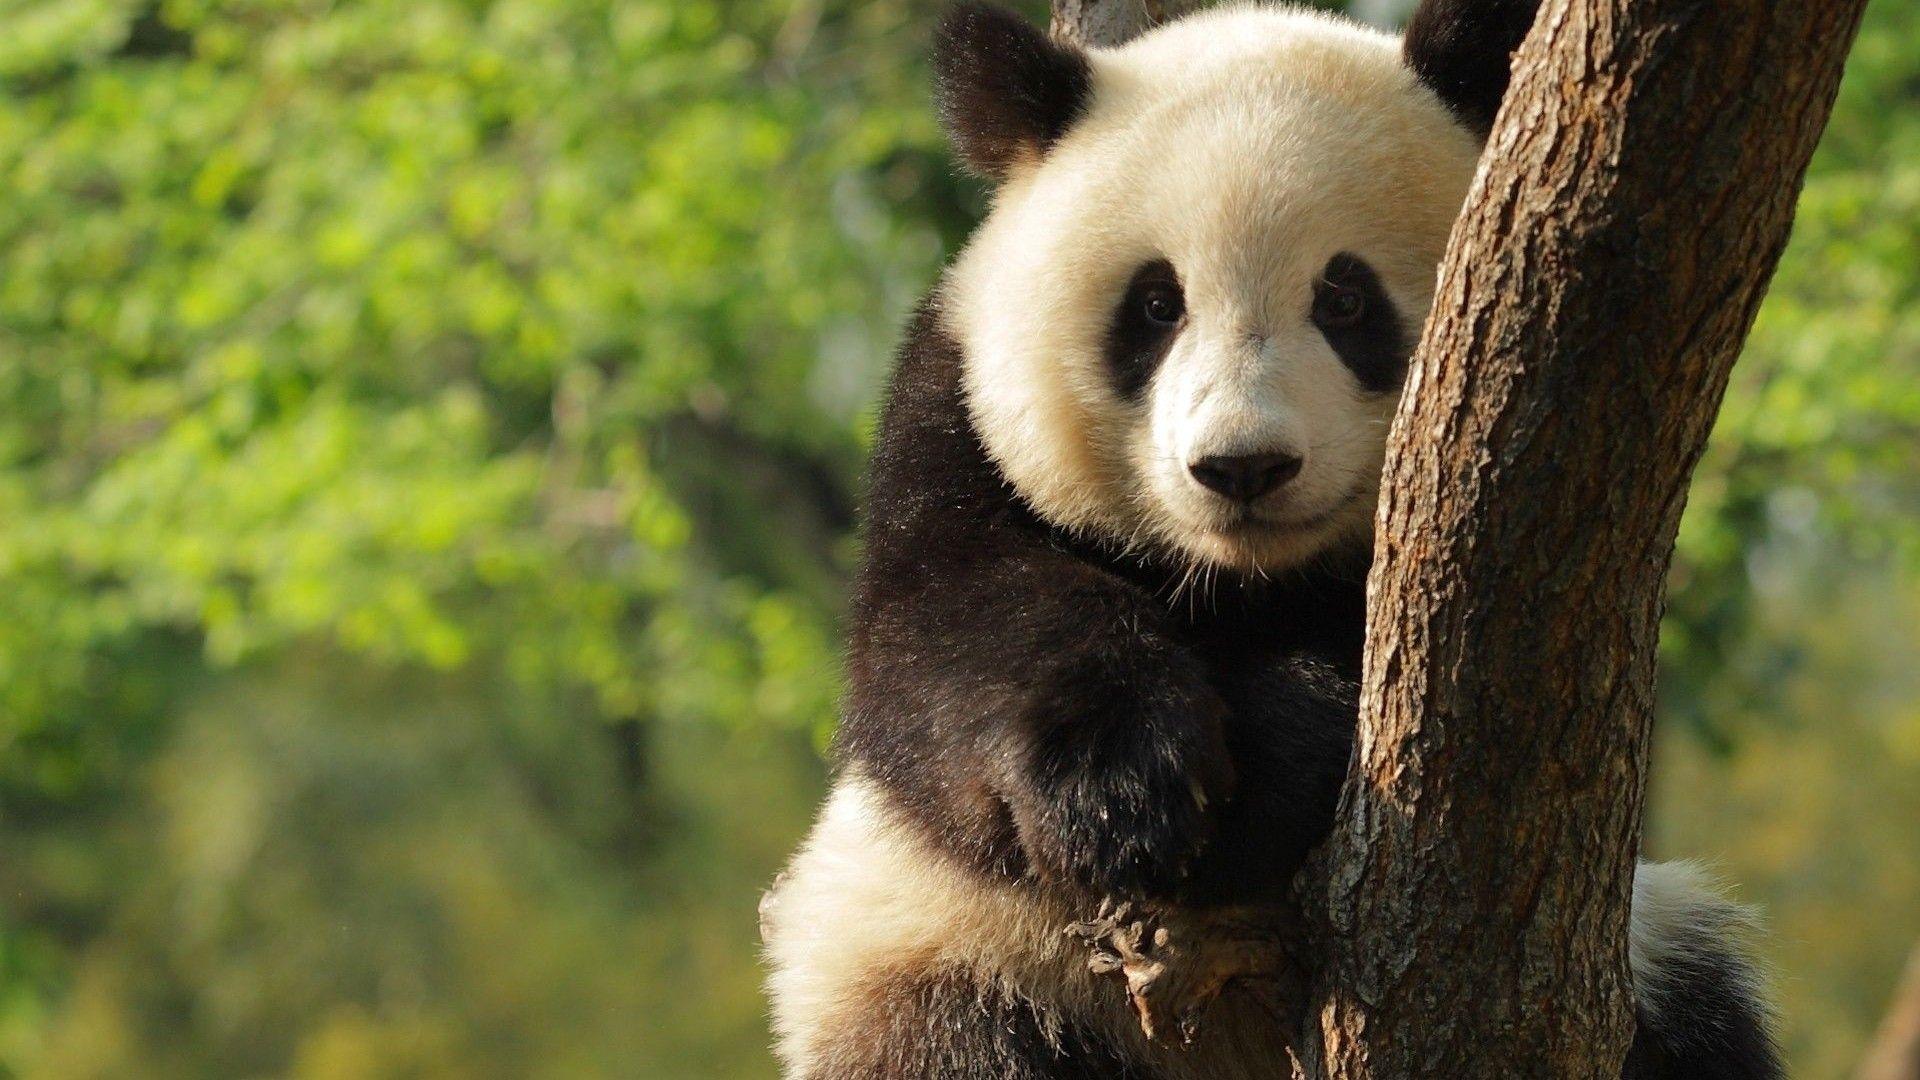 Giant Panda Hd Wallpapers Download Free Desktop Wallpaper